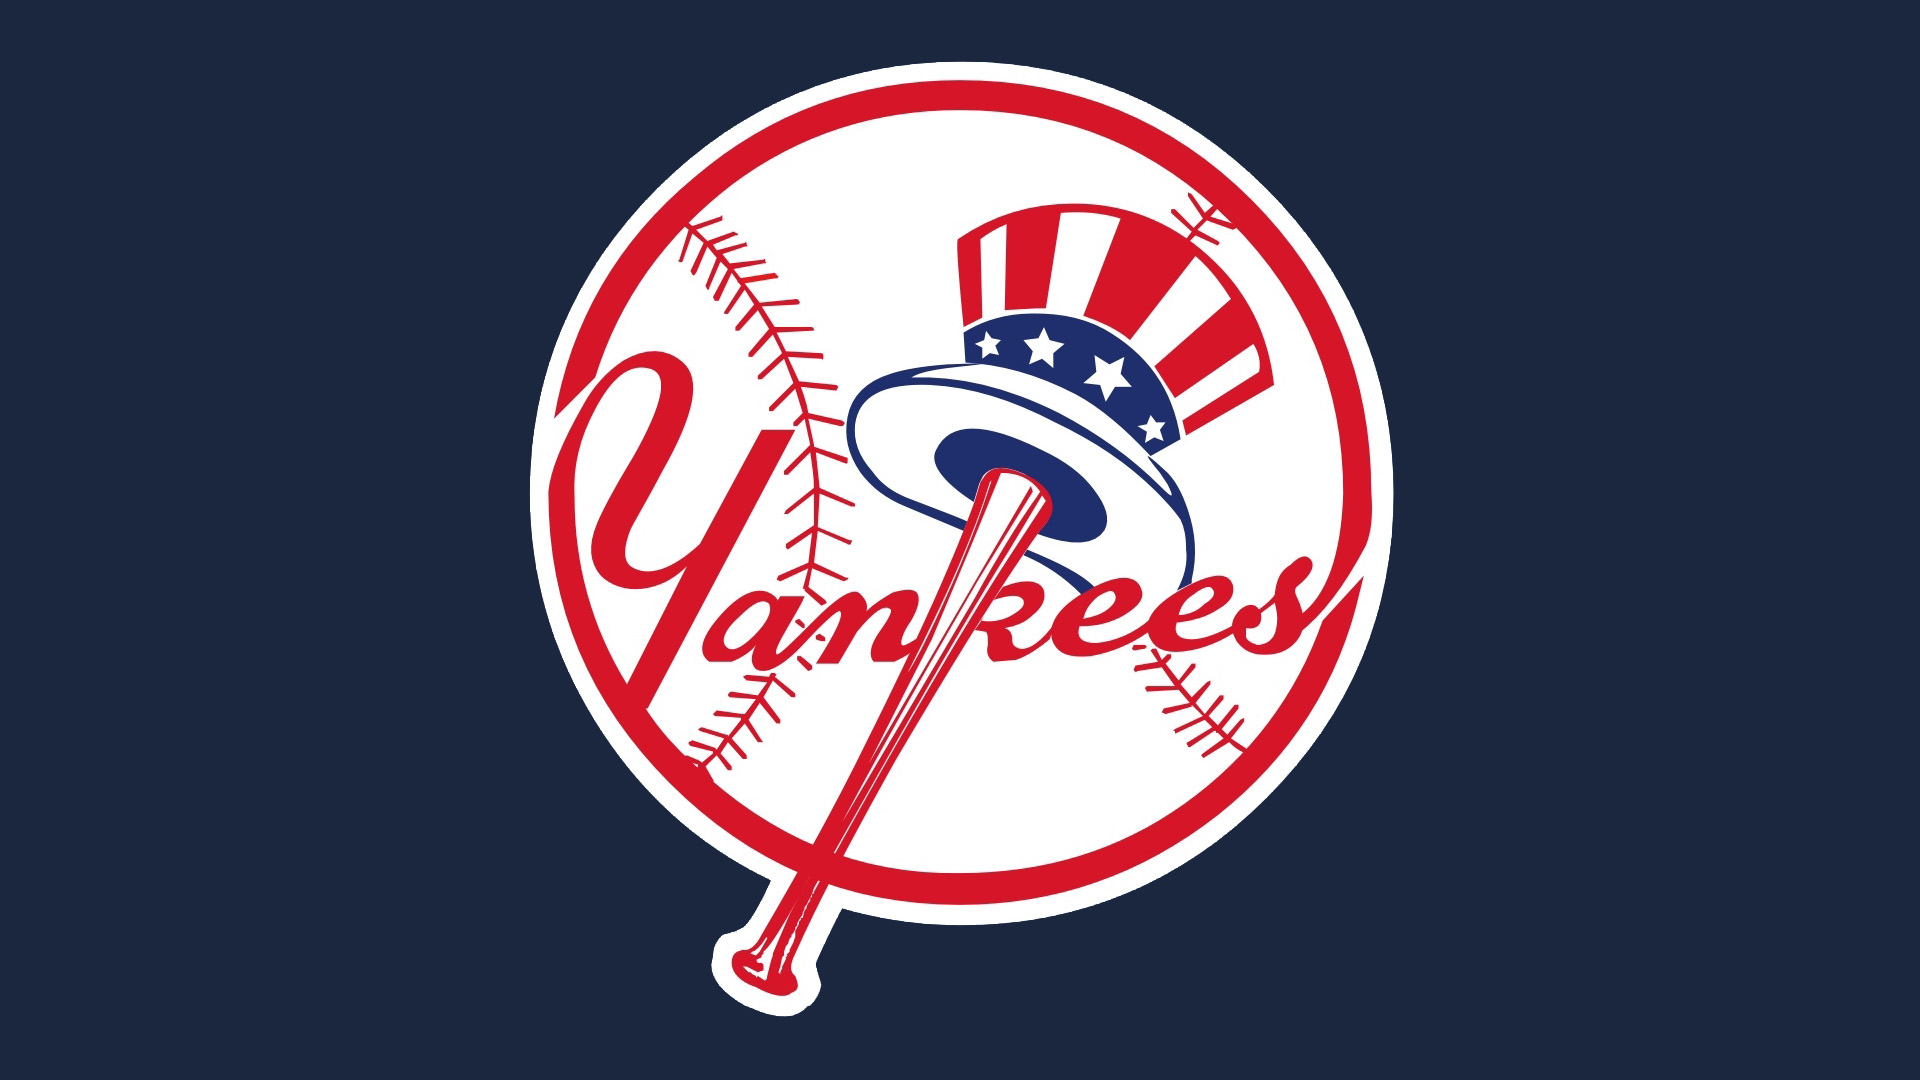 MLB New York Yankees Ball And American Hat Logo 1920x1080 HD MLB 1920x1080